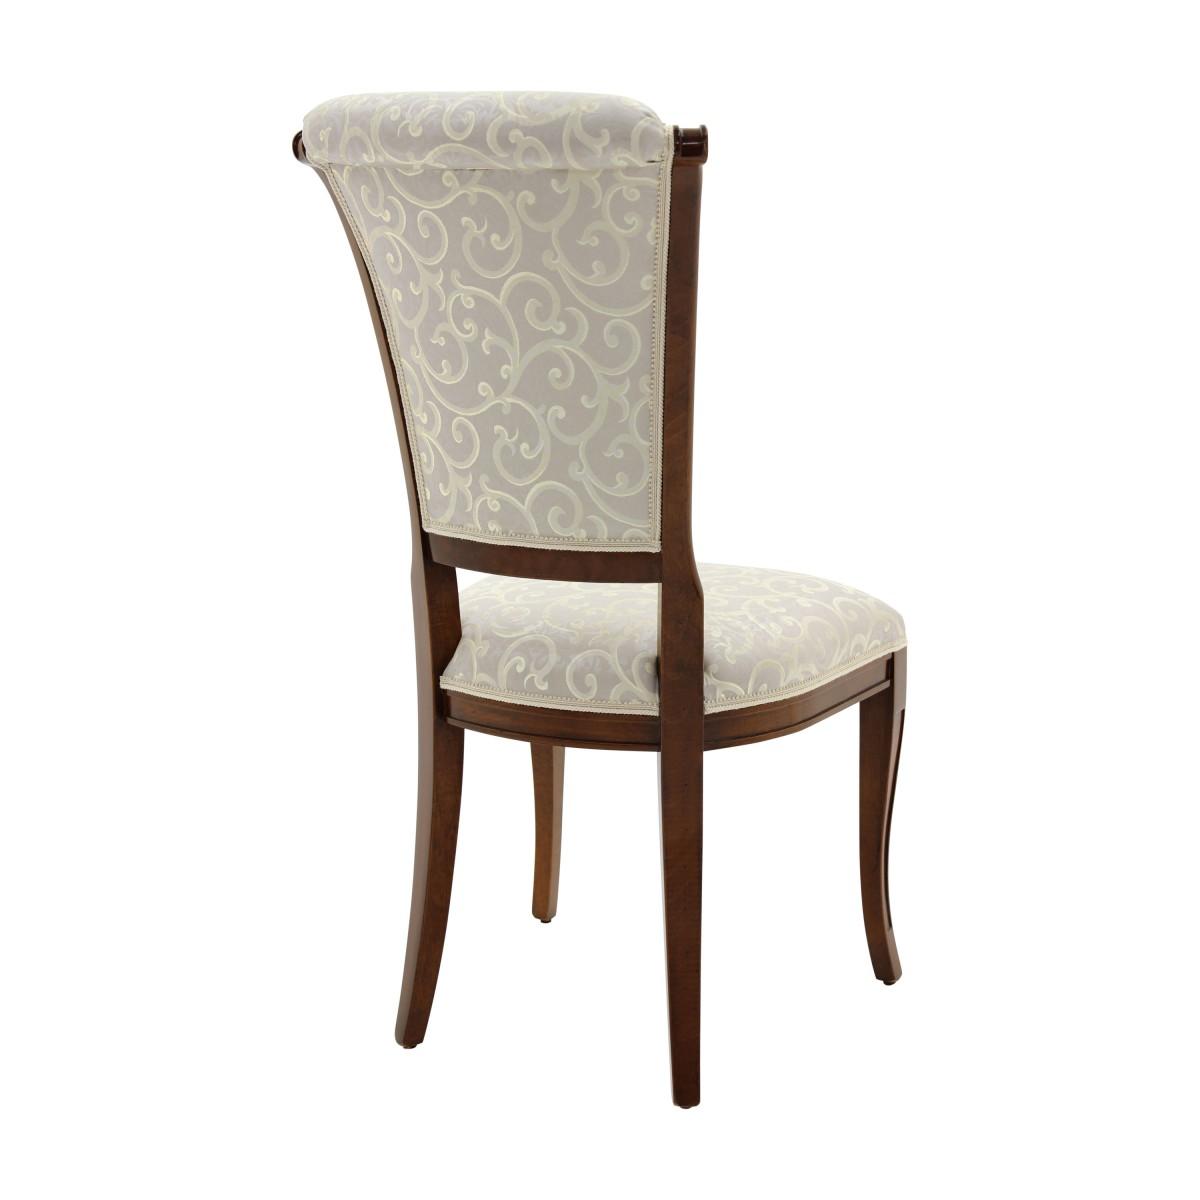 italian classic chair verona 3 6439